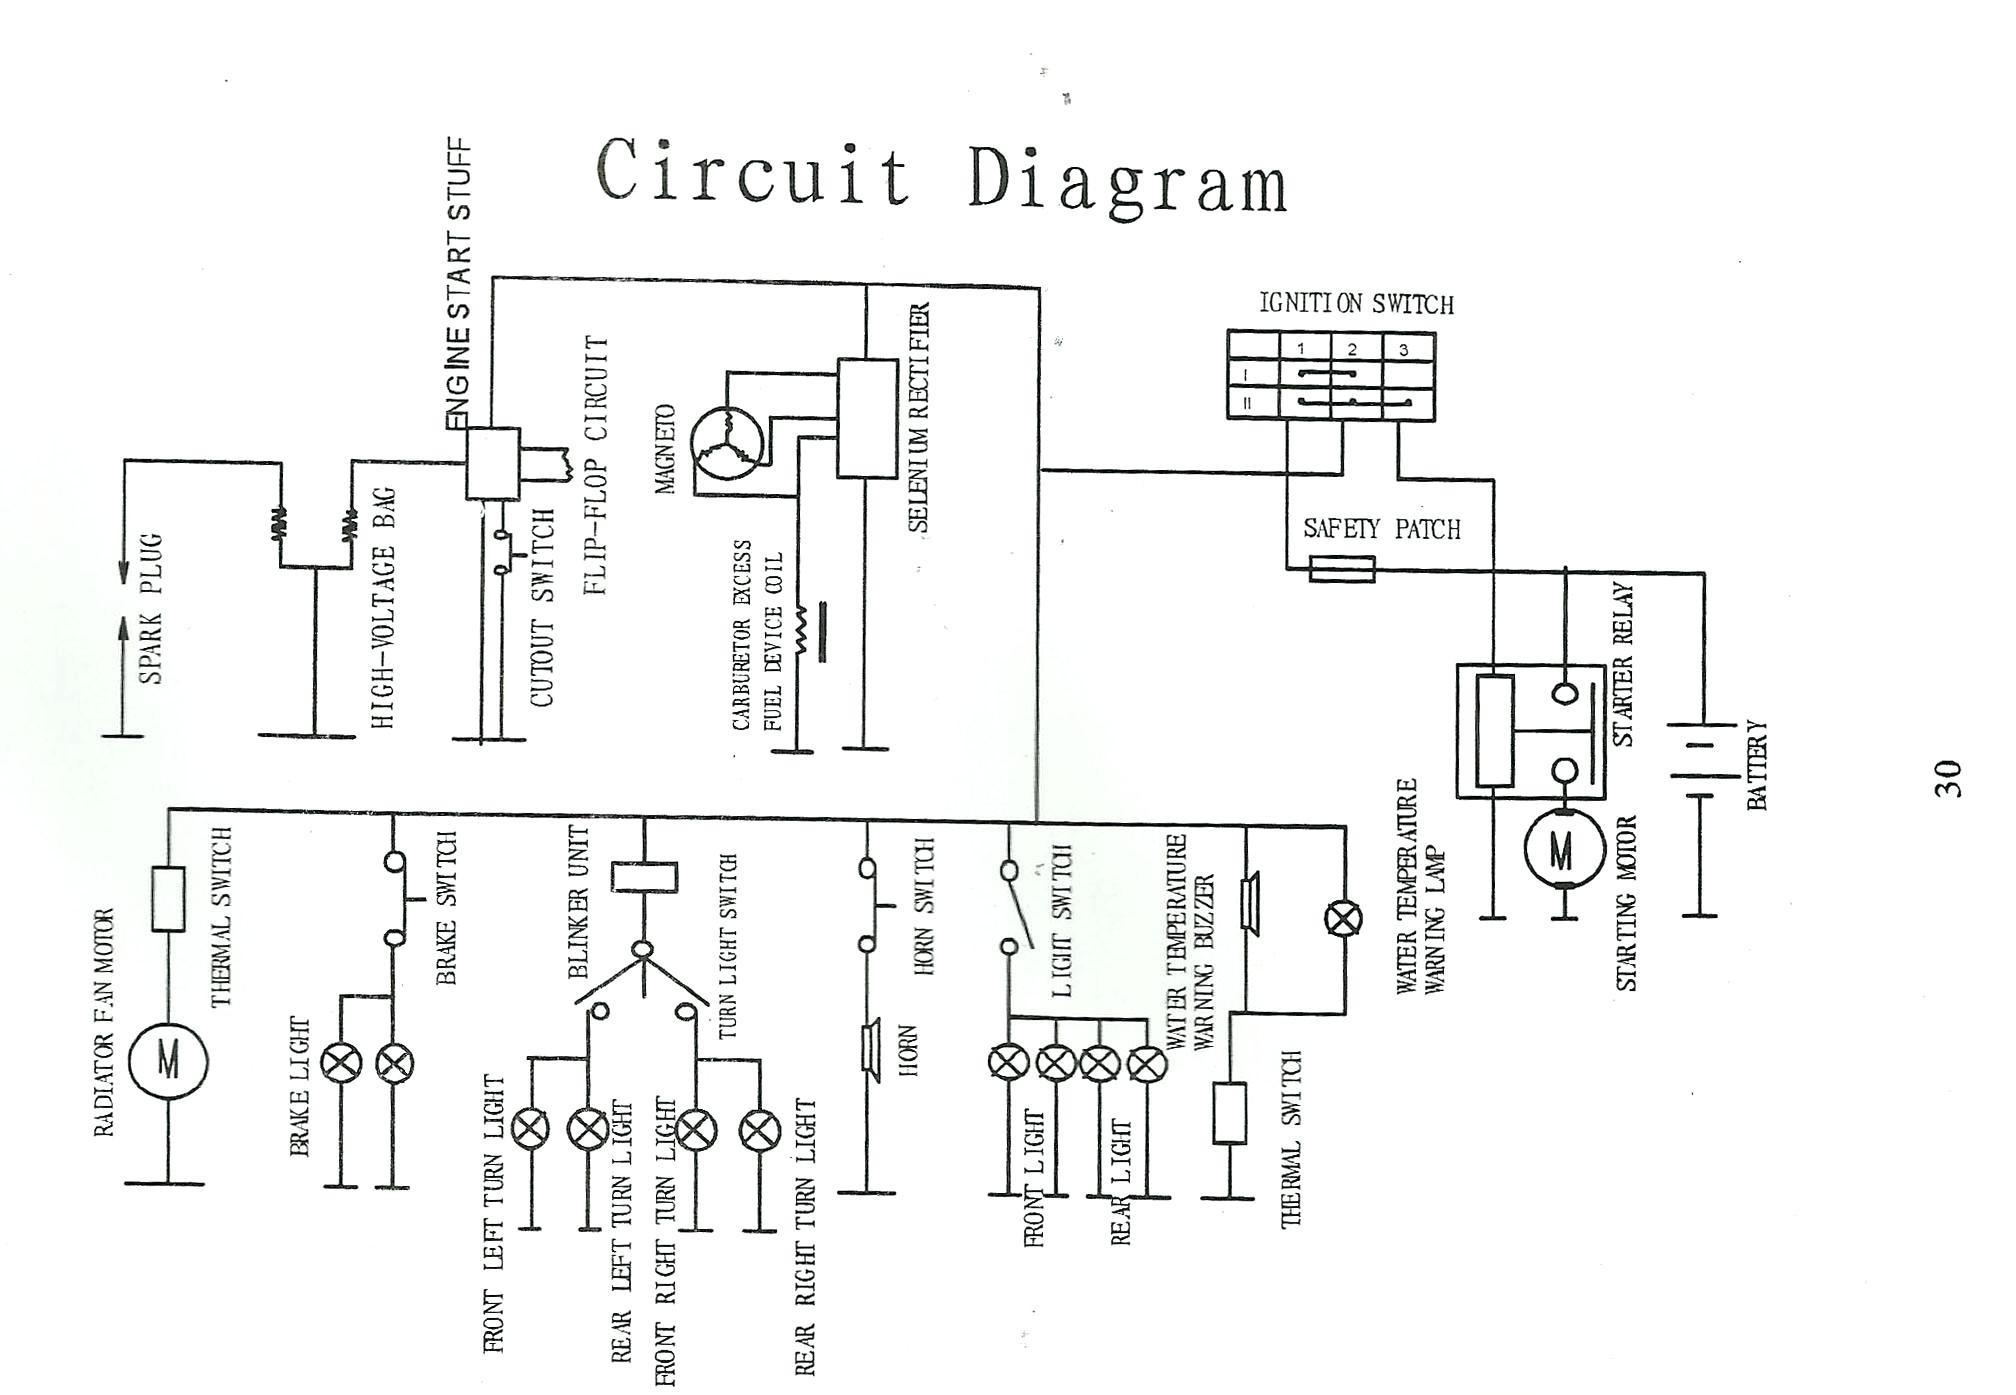 lifan 110 electric start wiring diagram